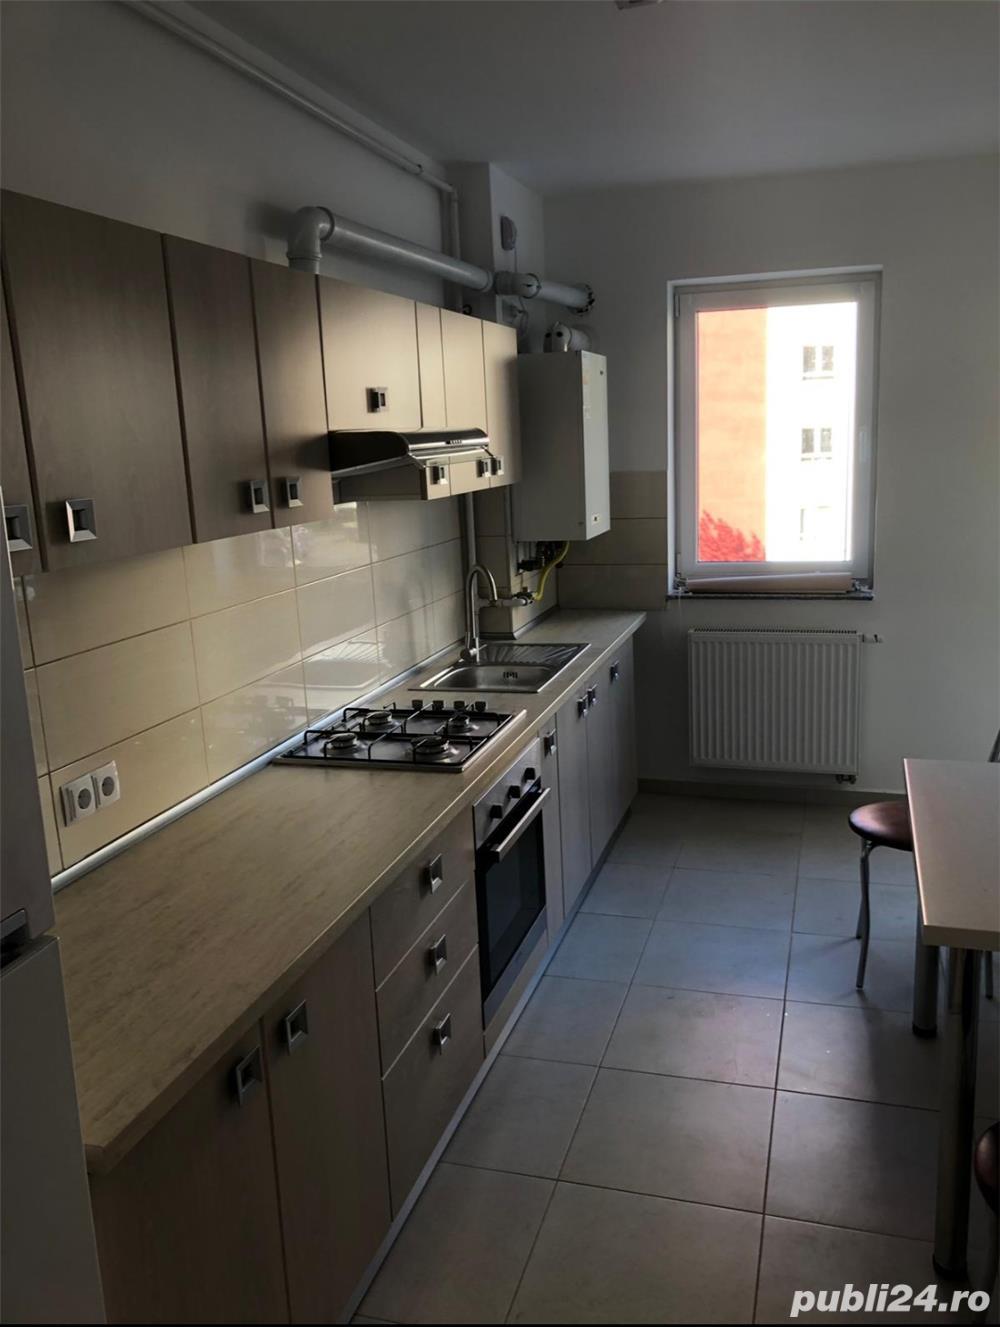 Apartament 2 camere de inchiriat Avantgarden 3